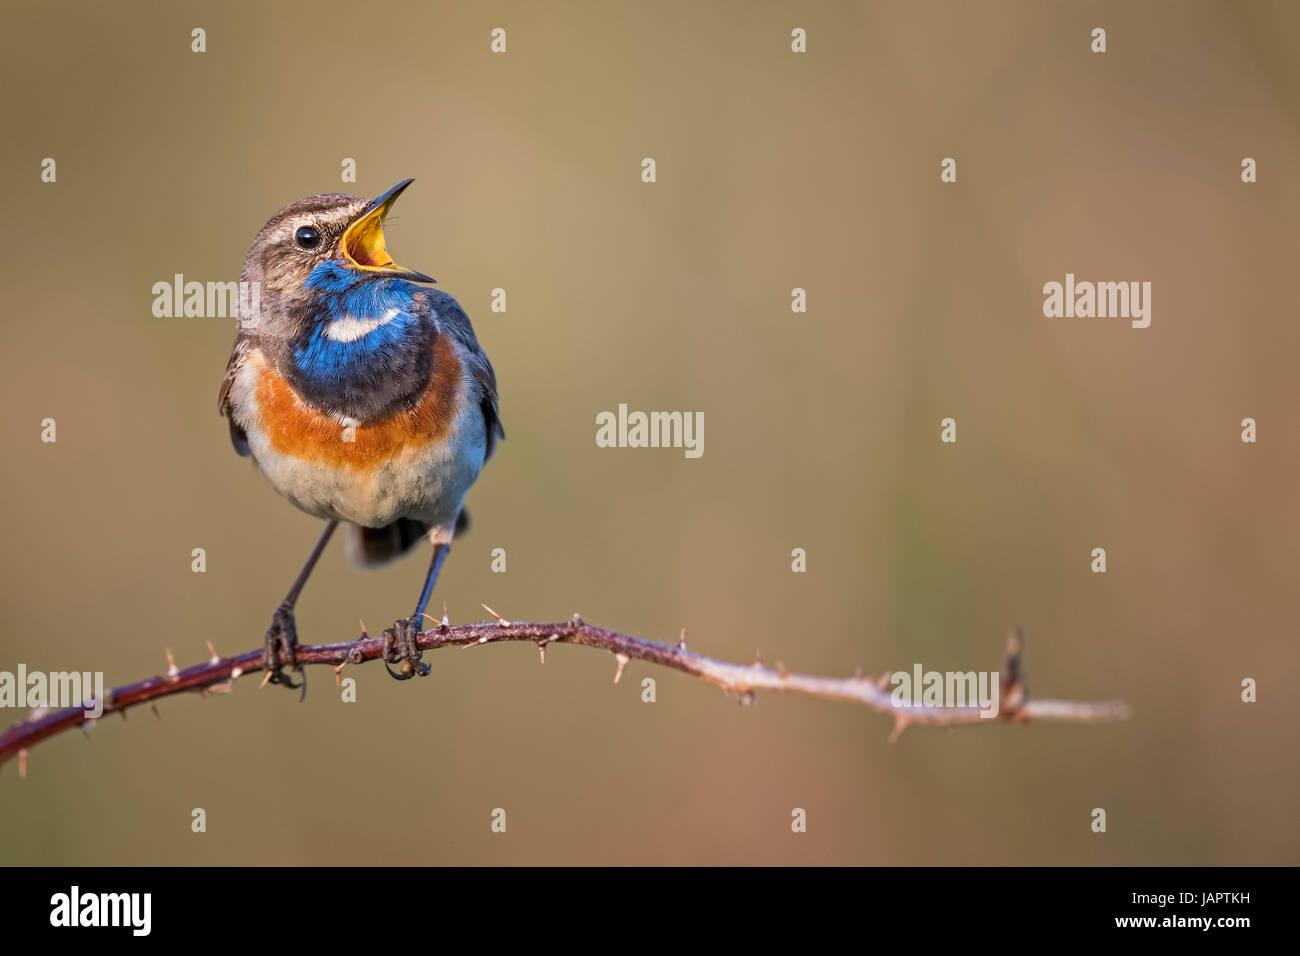 Bluethroat (Luscinia svecica) singing, courtship display, male, North Holland, Netherlands Stock Photo